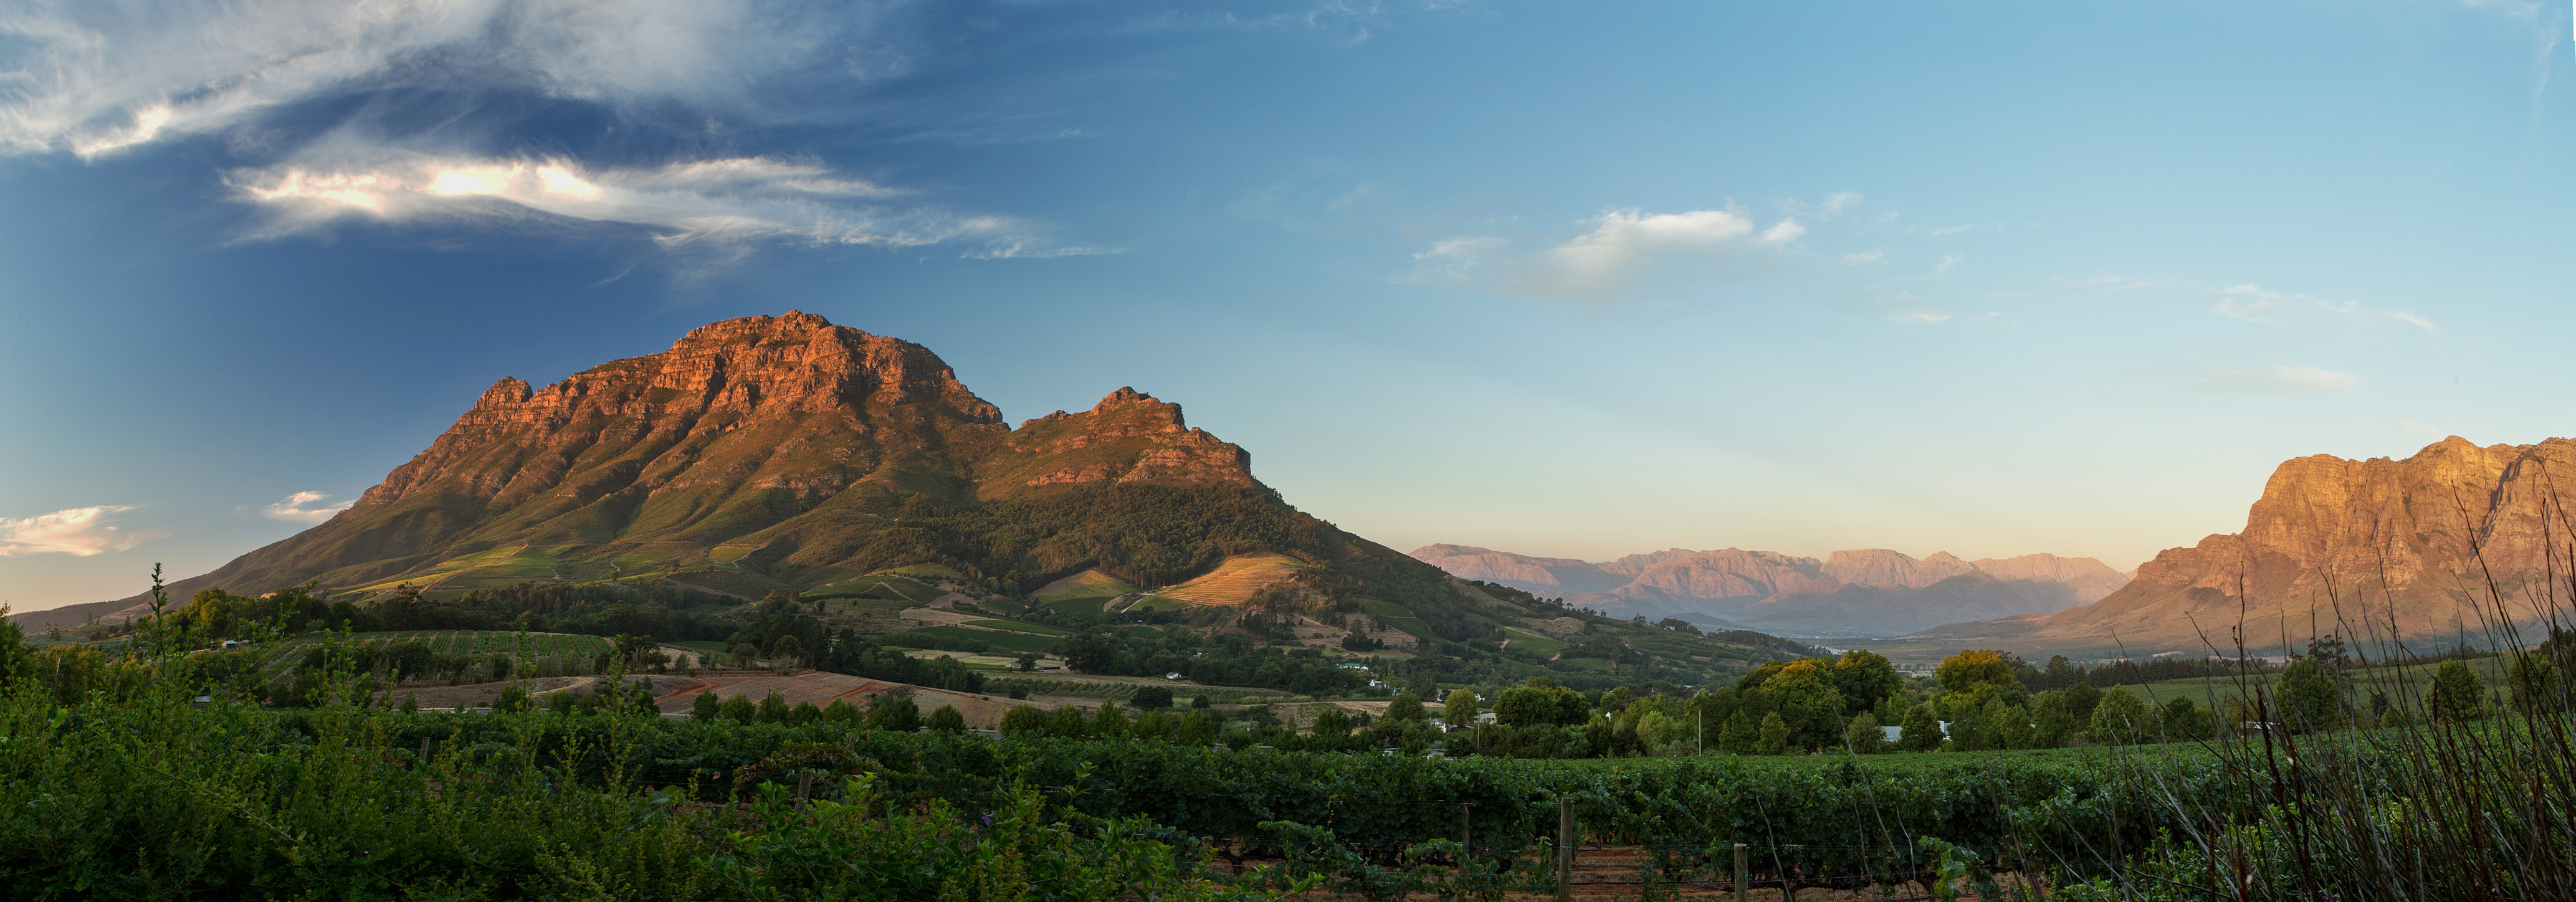 Diverse Flavours Adds Delaire Graff Estate Wines To Its Portfolio photo